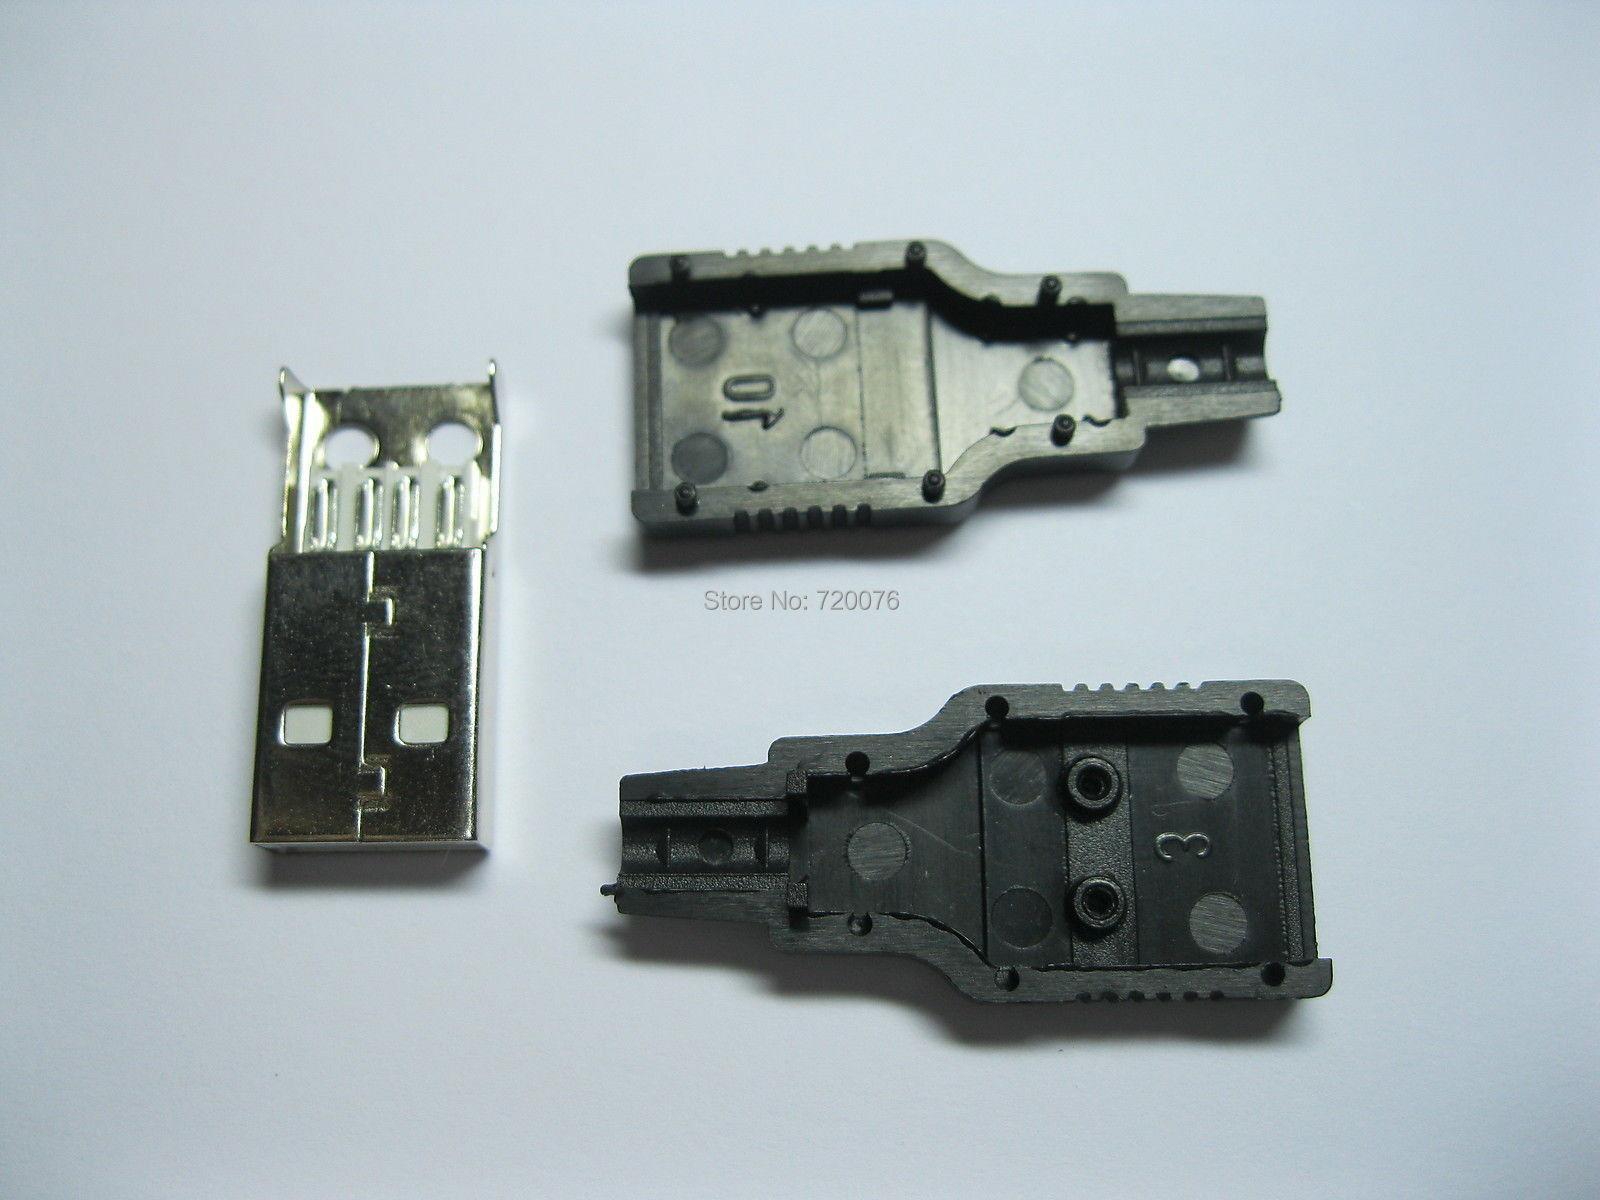 120 pcs A/M Solder 3-Piece 4 pin USB Male Plug Connector Black Plasitc Cover 10 pcs d sub vga db 15 pin male solder type connector socket 2 rows db15f male